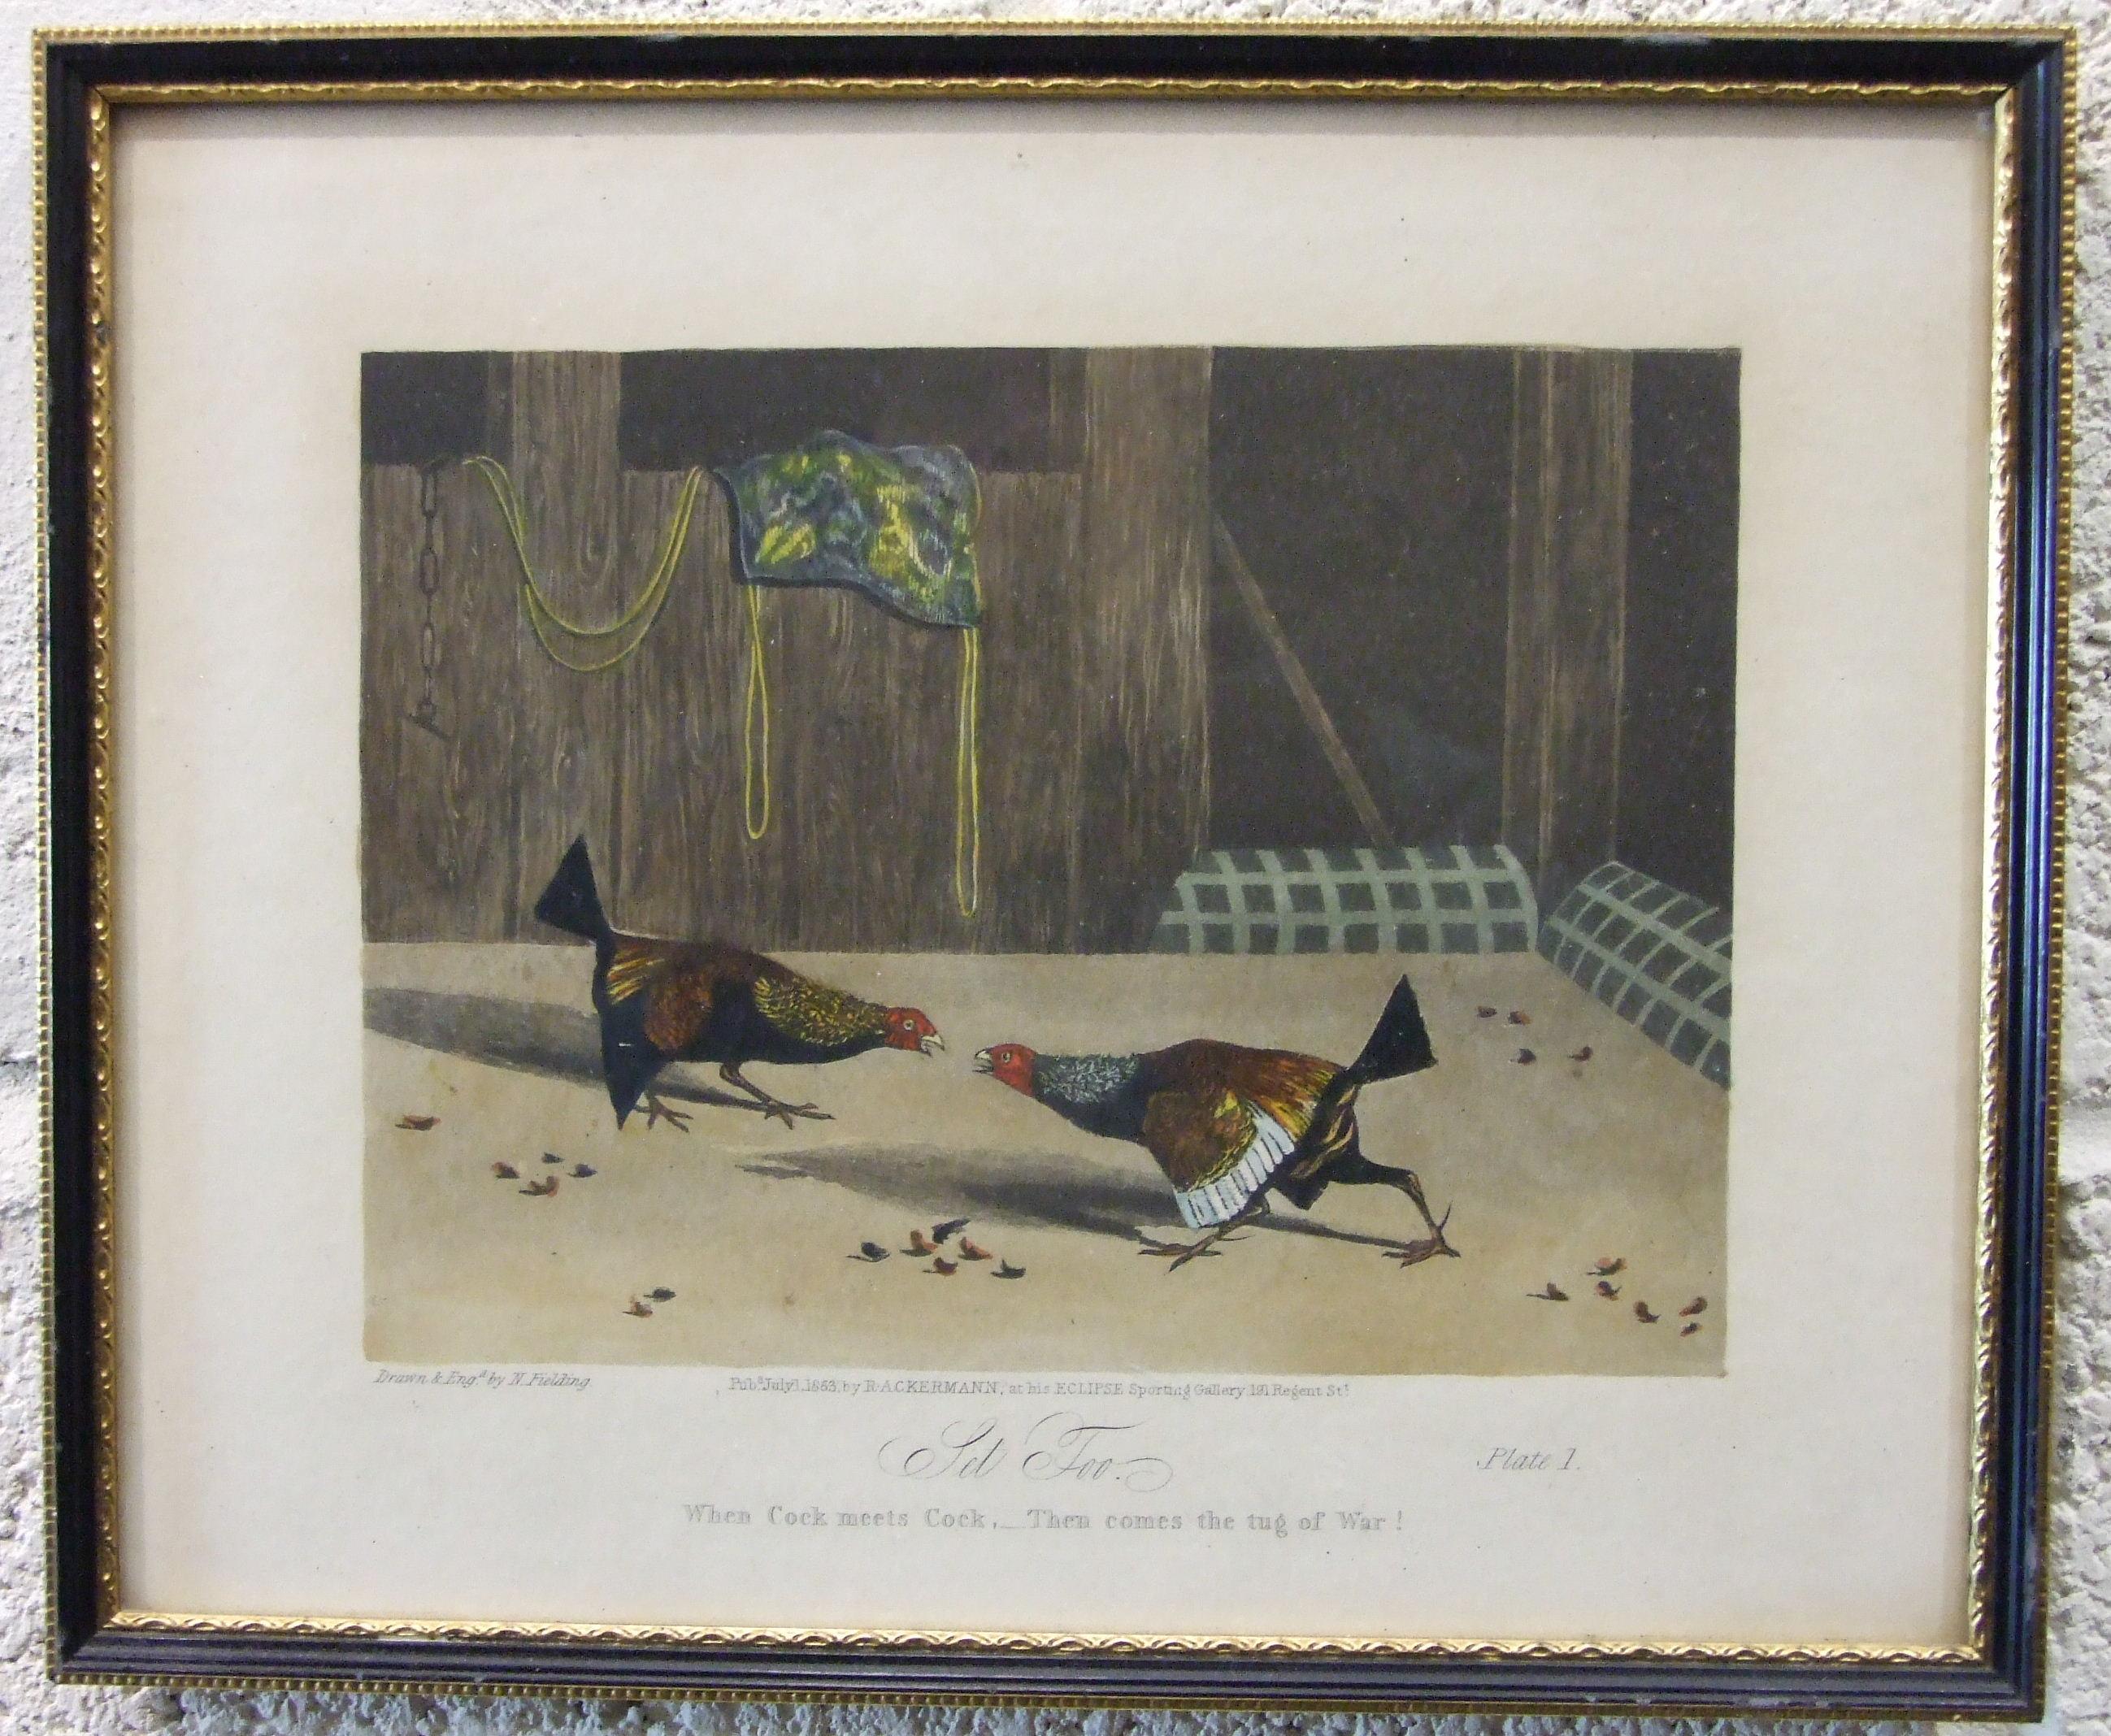 Lot 42 - After N Fielding, a set of six cock fighting prints, pub. R A Ackermann 1853, 22 x 27cm, (6).